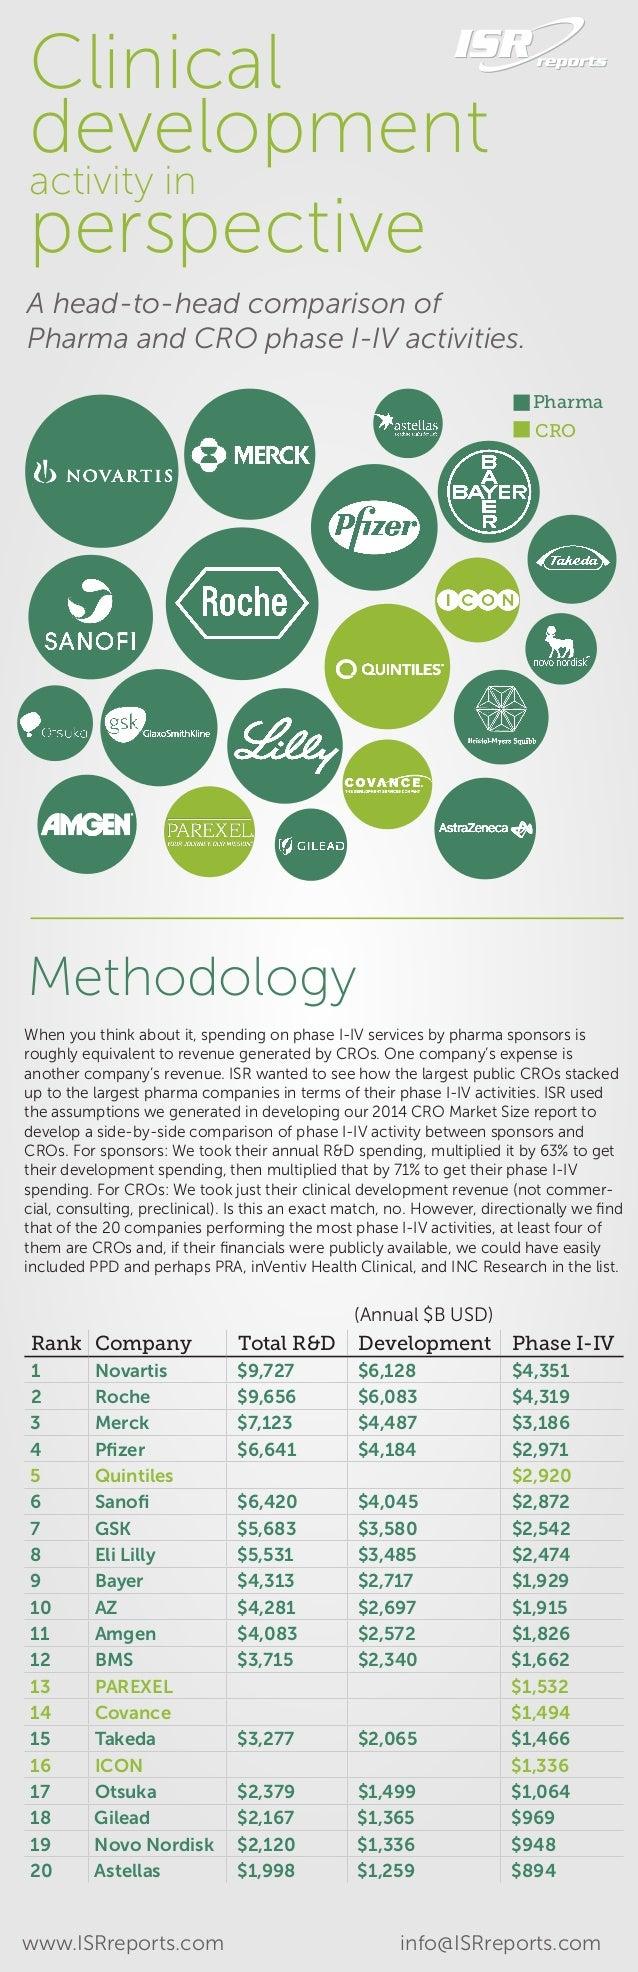 Pharma CRO A head-to-head comparison of Pharma and CRO phase I-IV activities. Rank Company Total R&D Development Phase I-I...